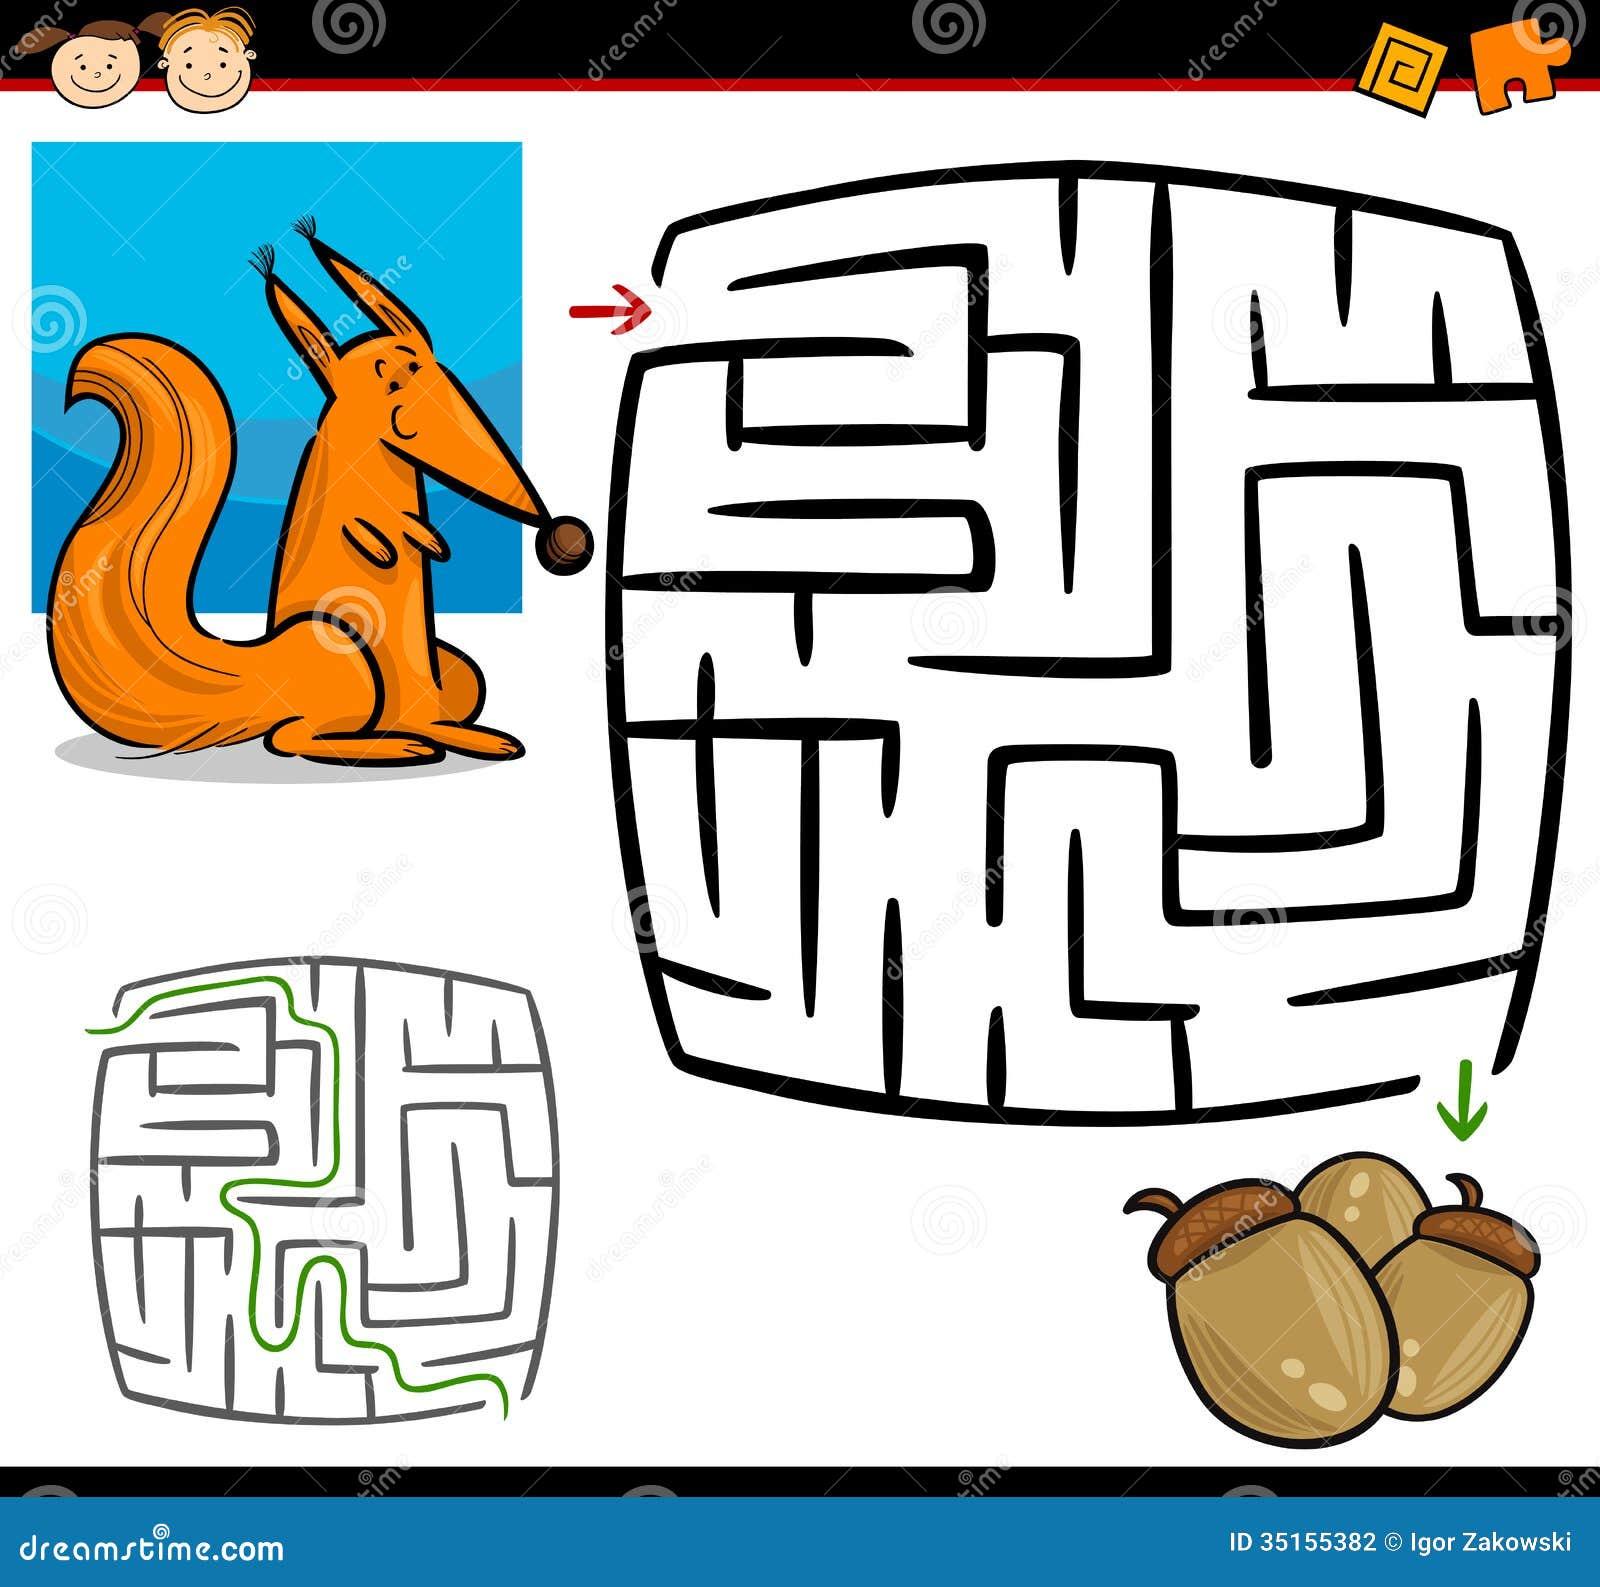 Maze for preschool